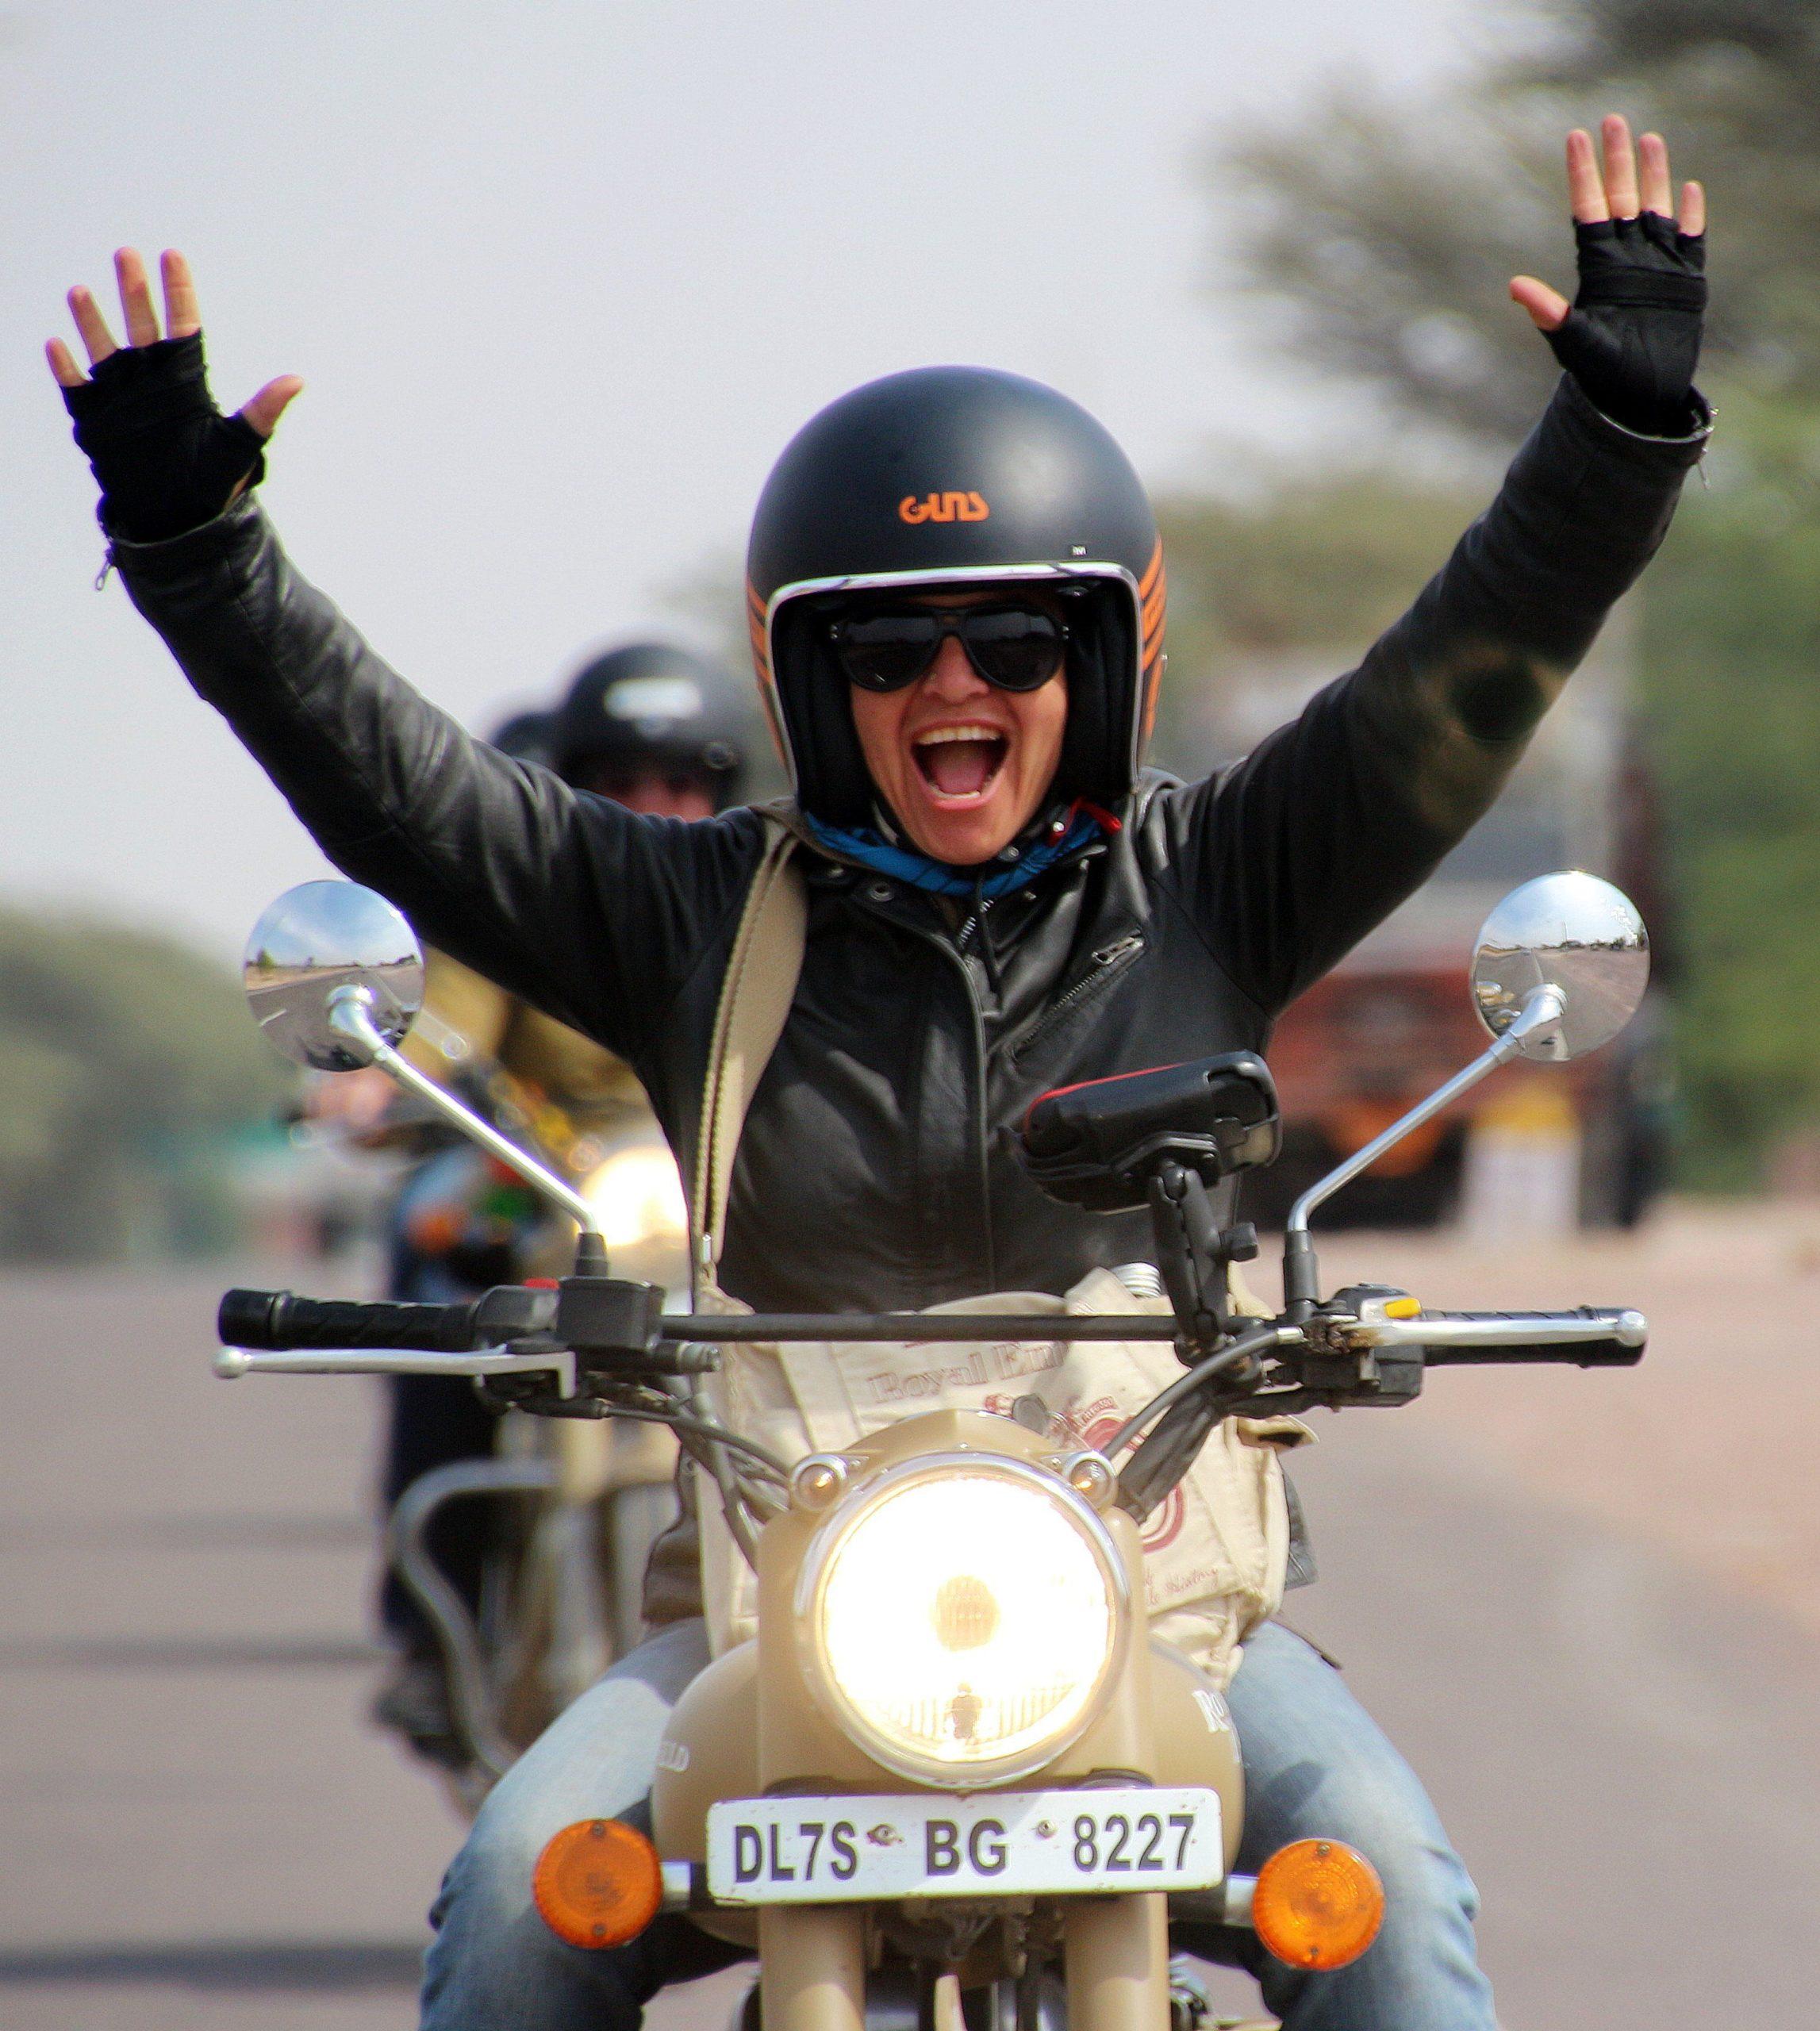 happy rider female